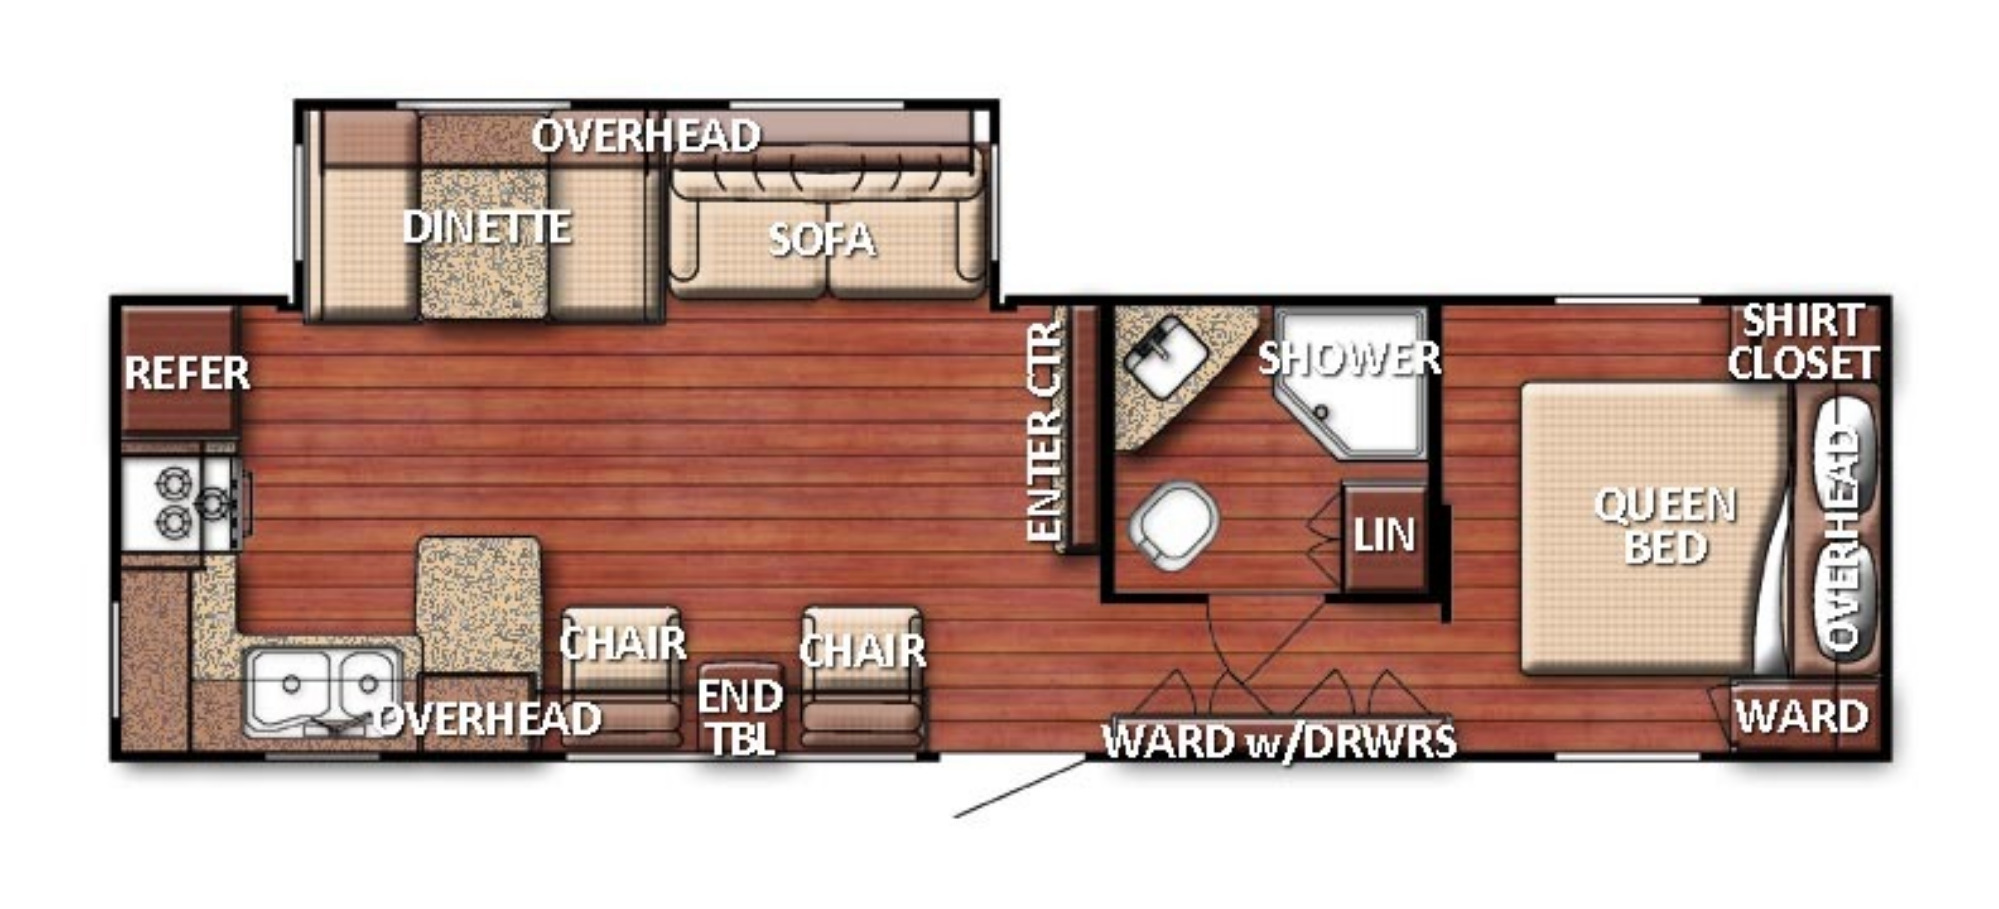 View Floor Plan for 2019 GULF STREAM INNSBRUCK 295SBW